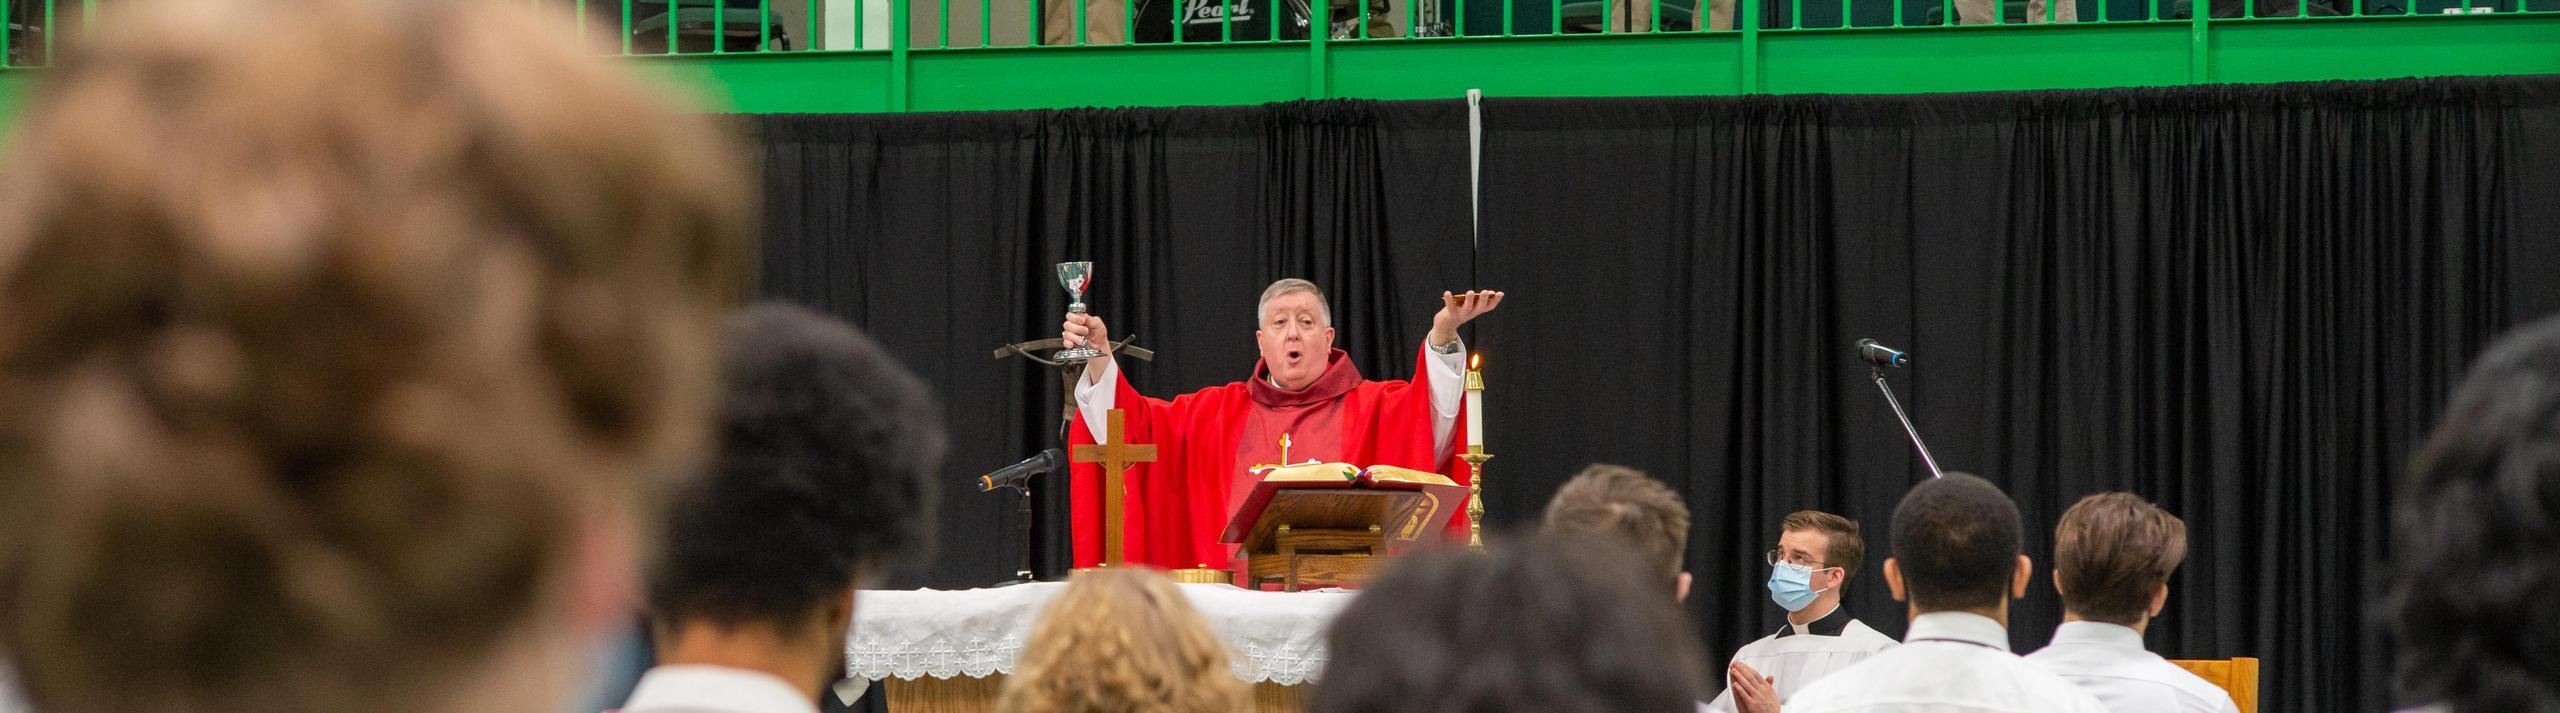 Archbishop Rozanski Celebrating Mass at St. Mary's